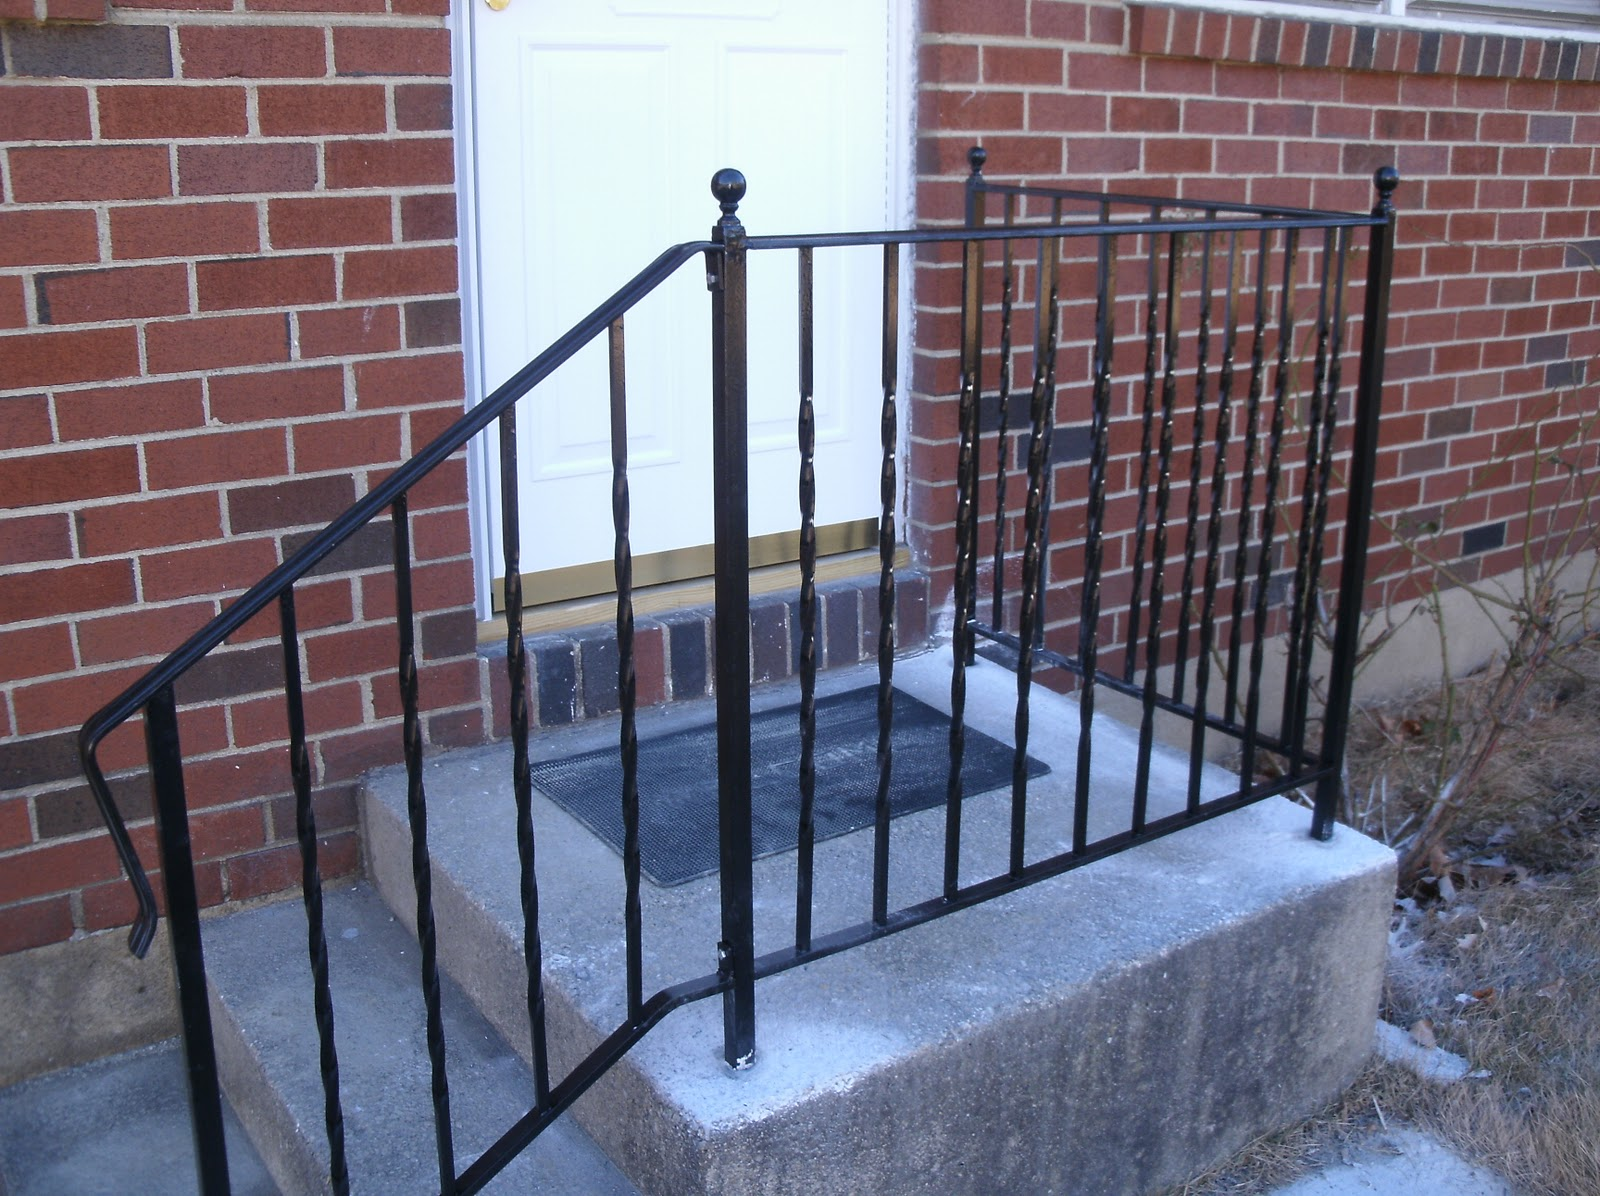 Outdoor Wrought Iron Railings - America's Best Lifechangers